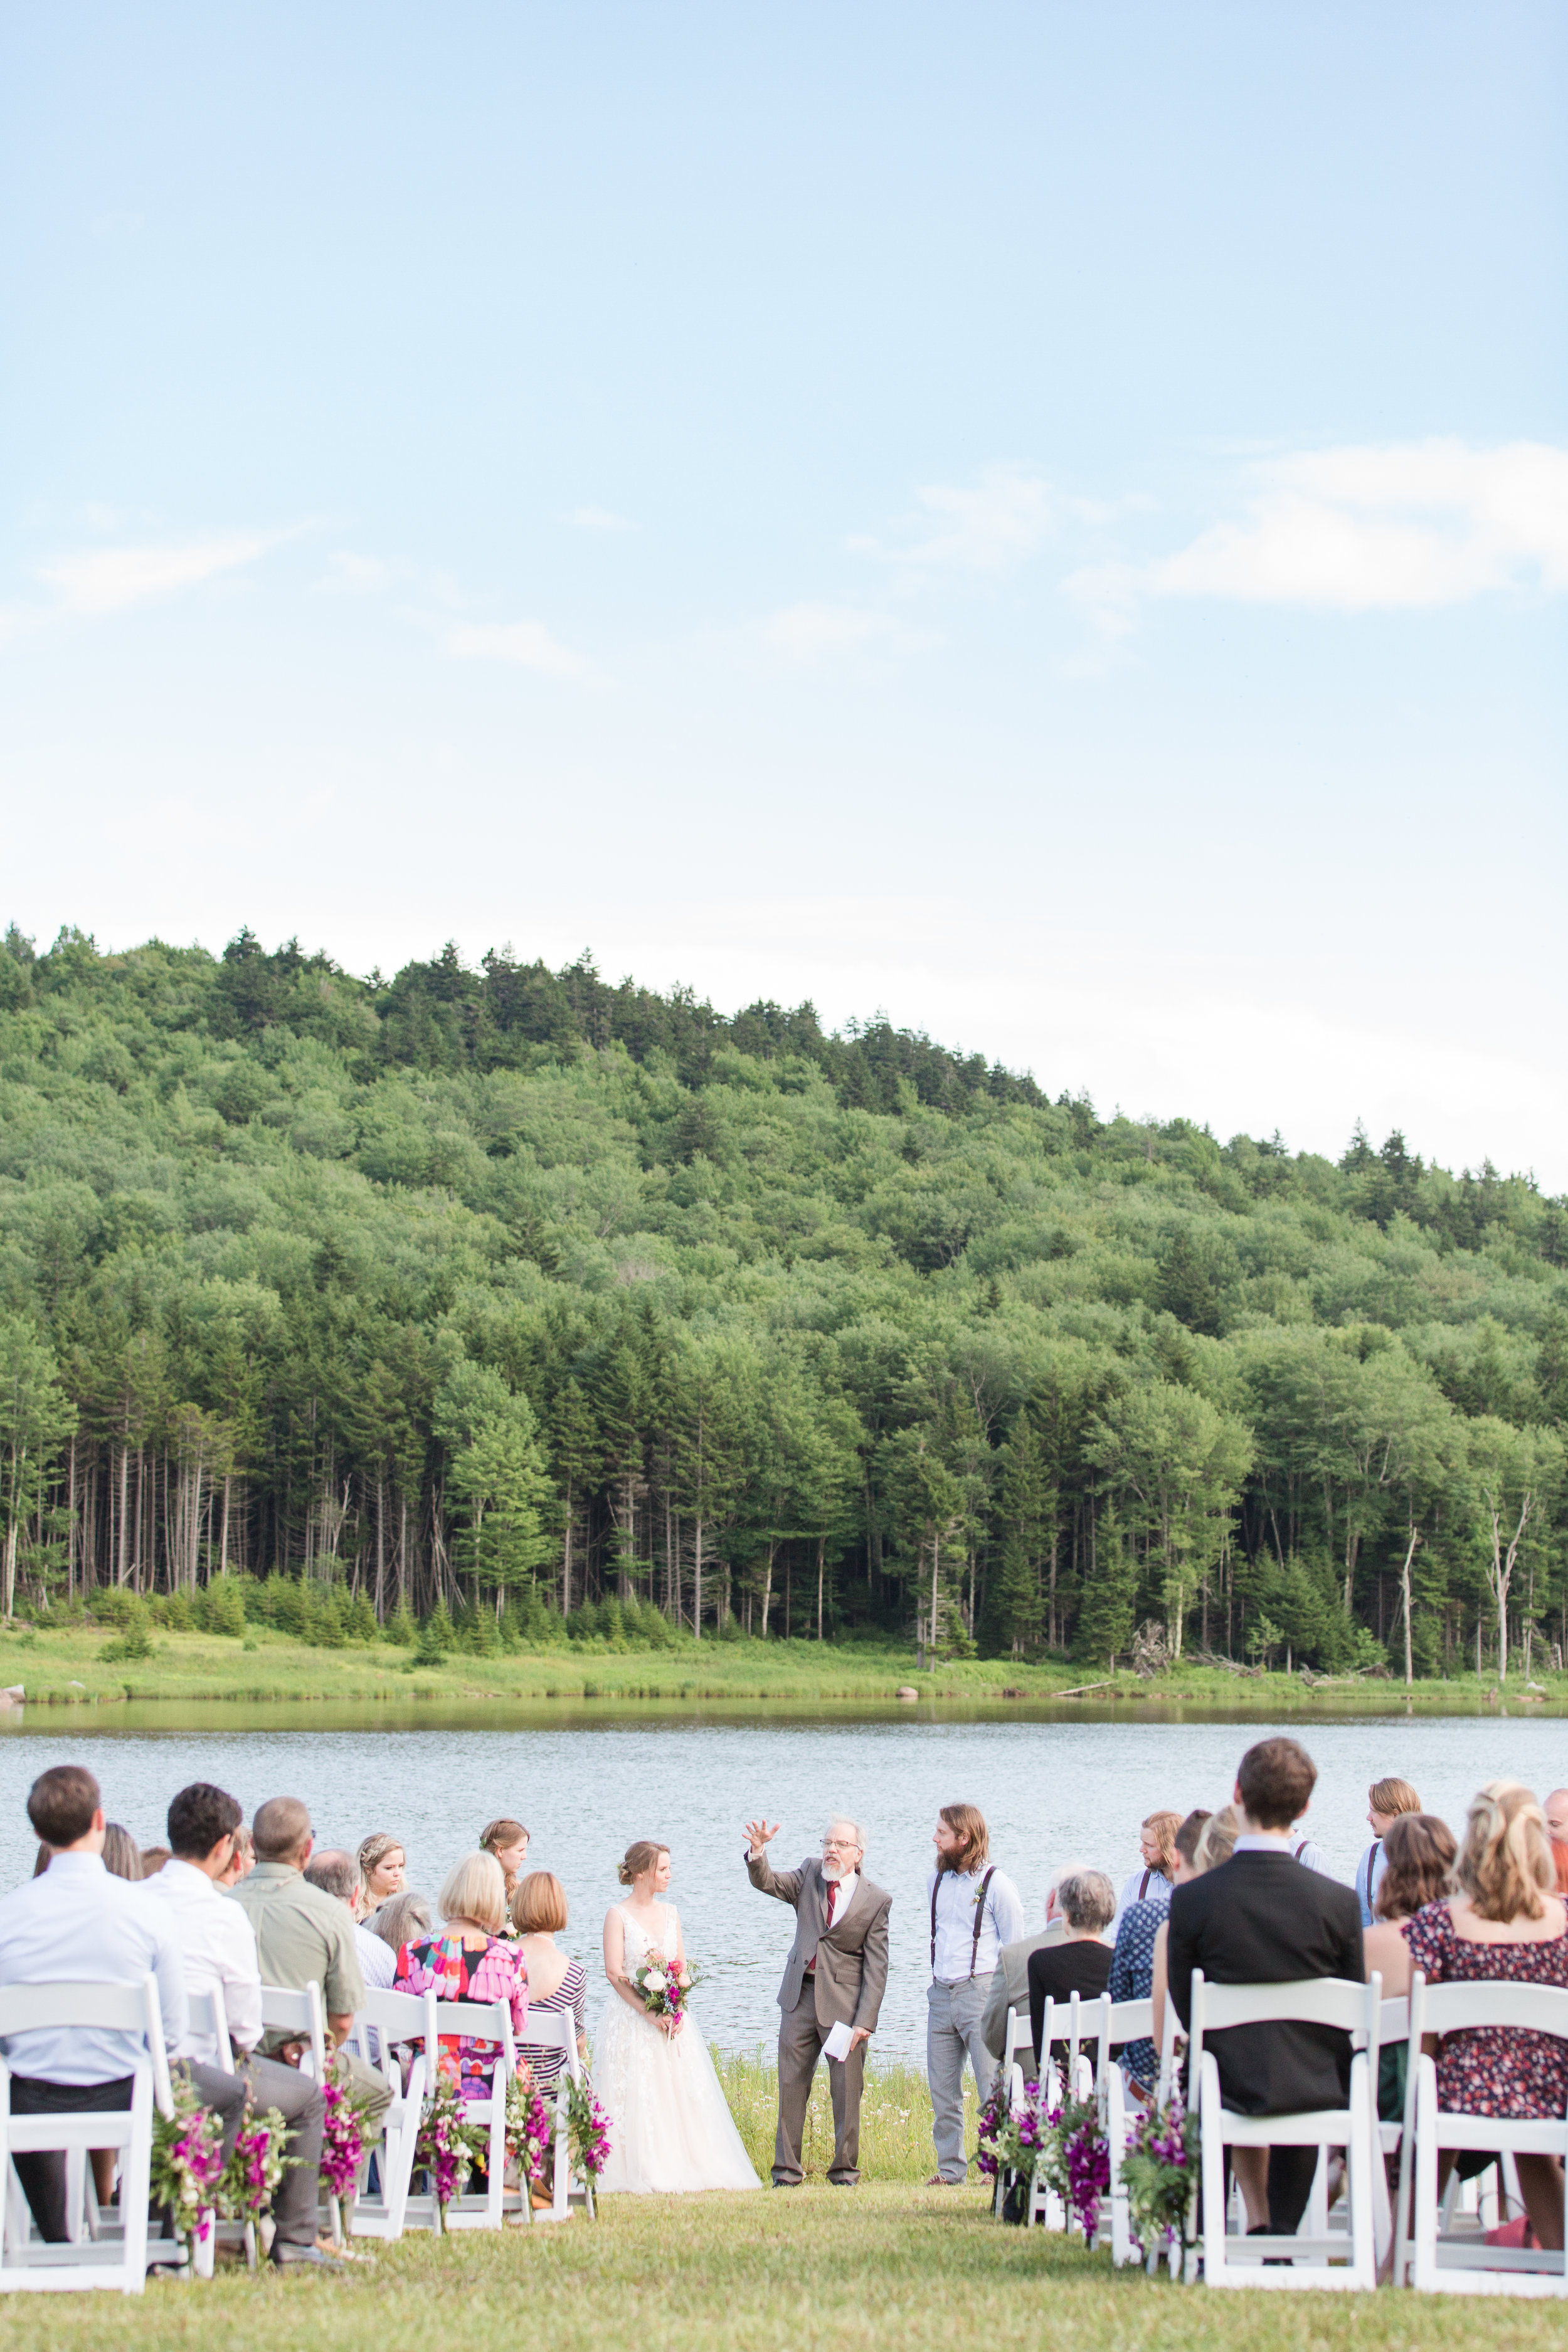 authentic genuine wedding photography in wv- lakeside mountain ceremony wedding wv